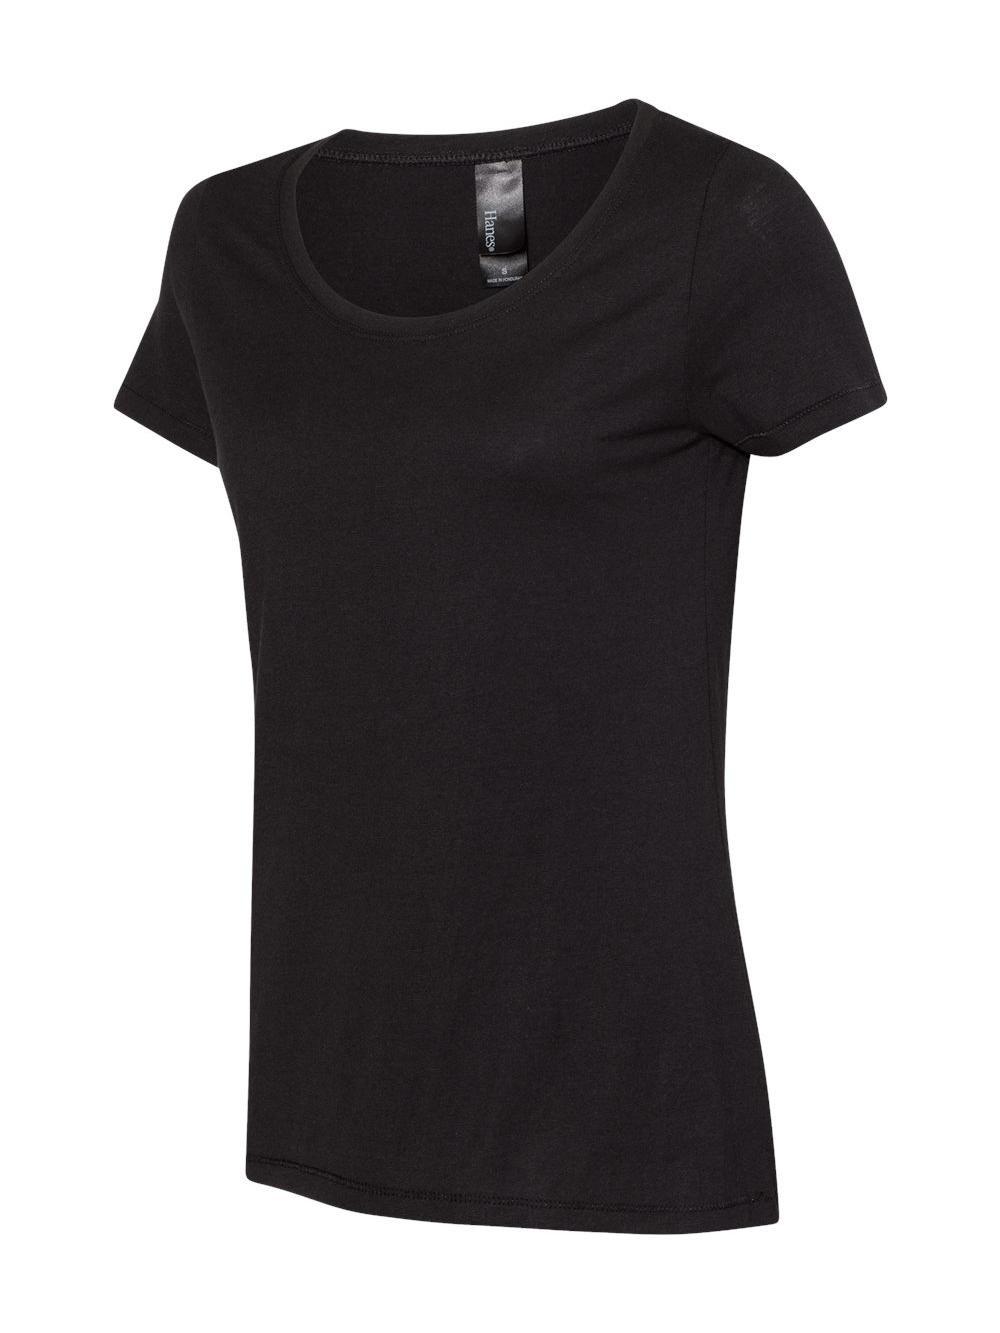 Hanes-Women-039-s-Modal-Triblend-T-Shirt-MO150 thumbnail 22